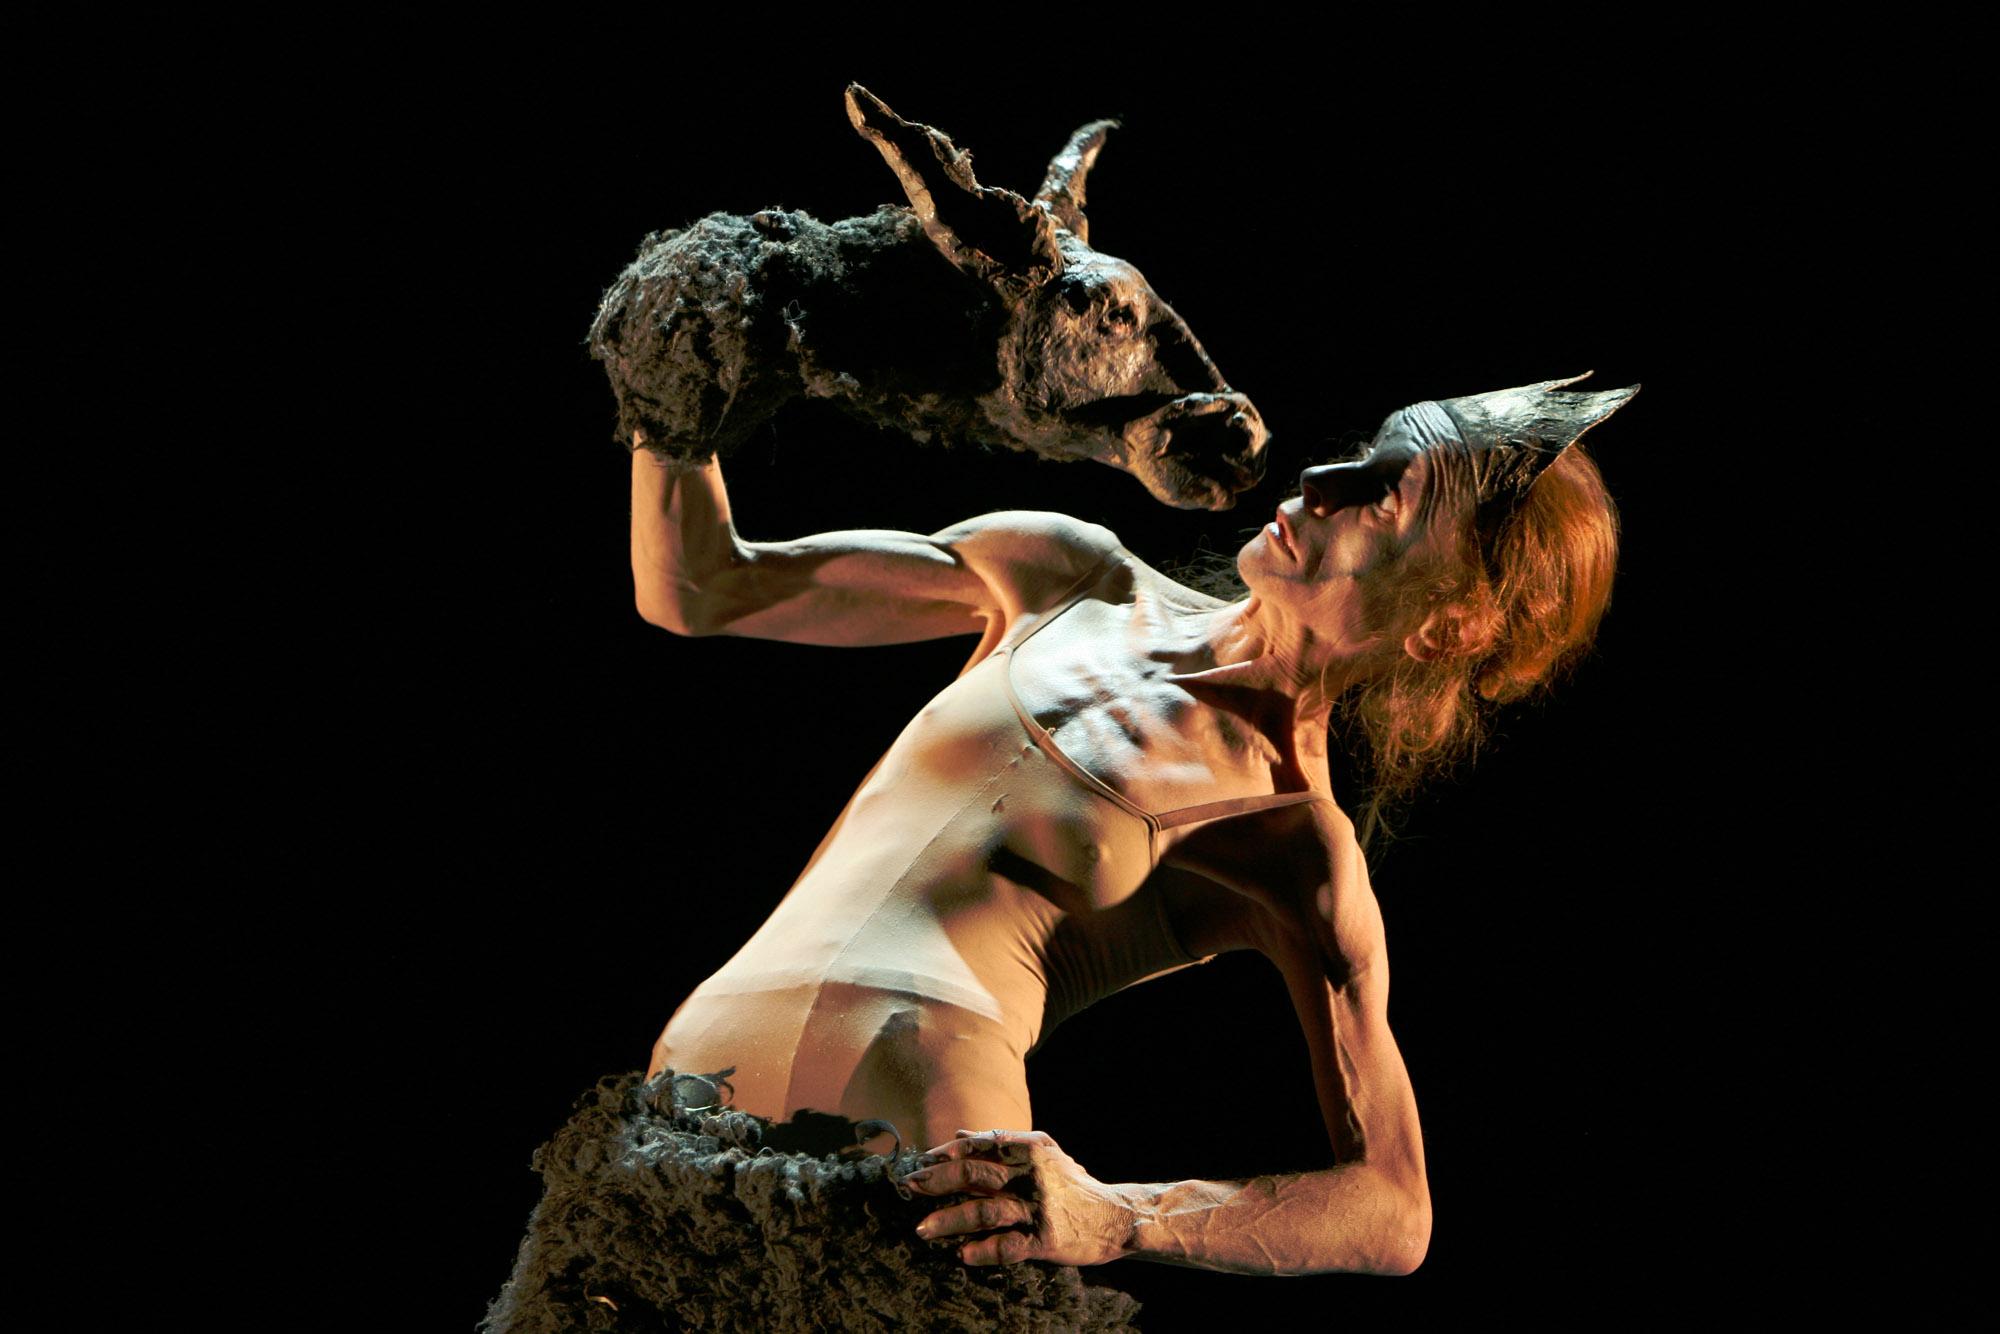 Ilka Schönbein (Theater Meschugge. La vieja dama y la bestia